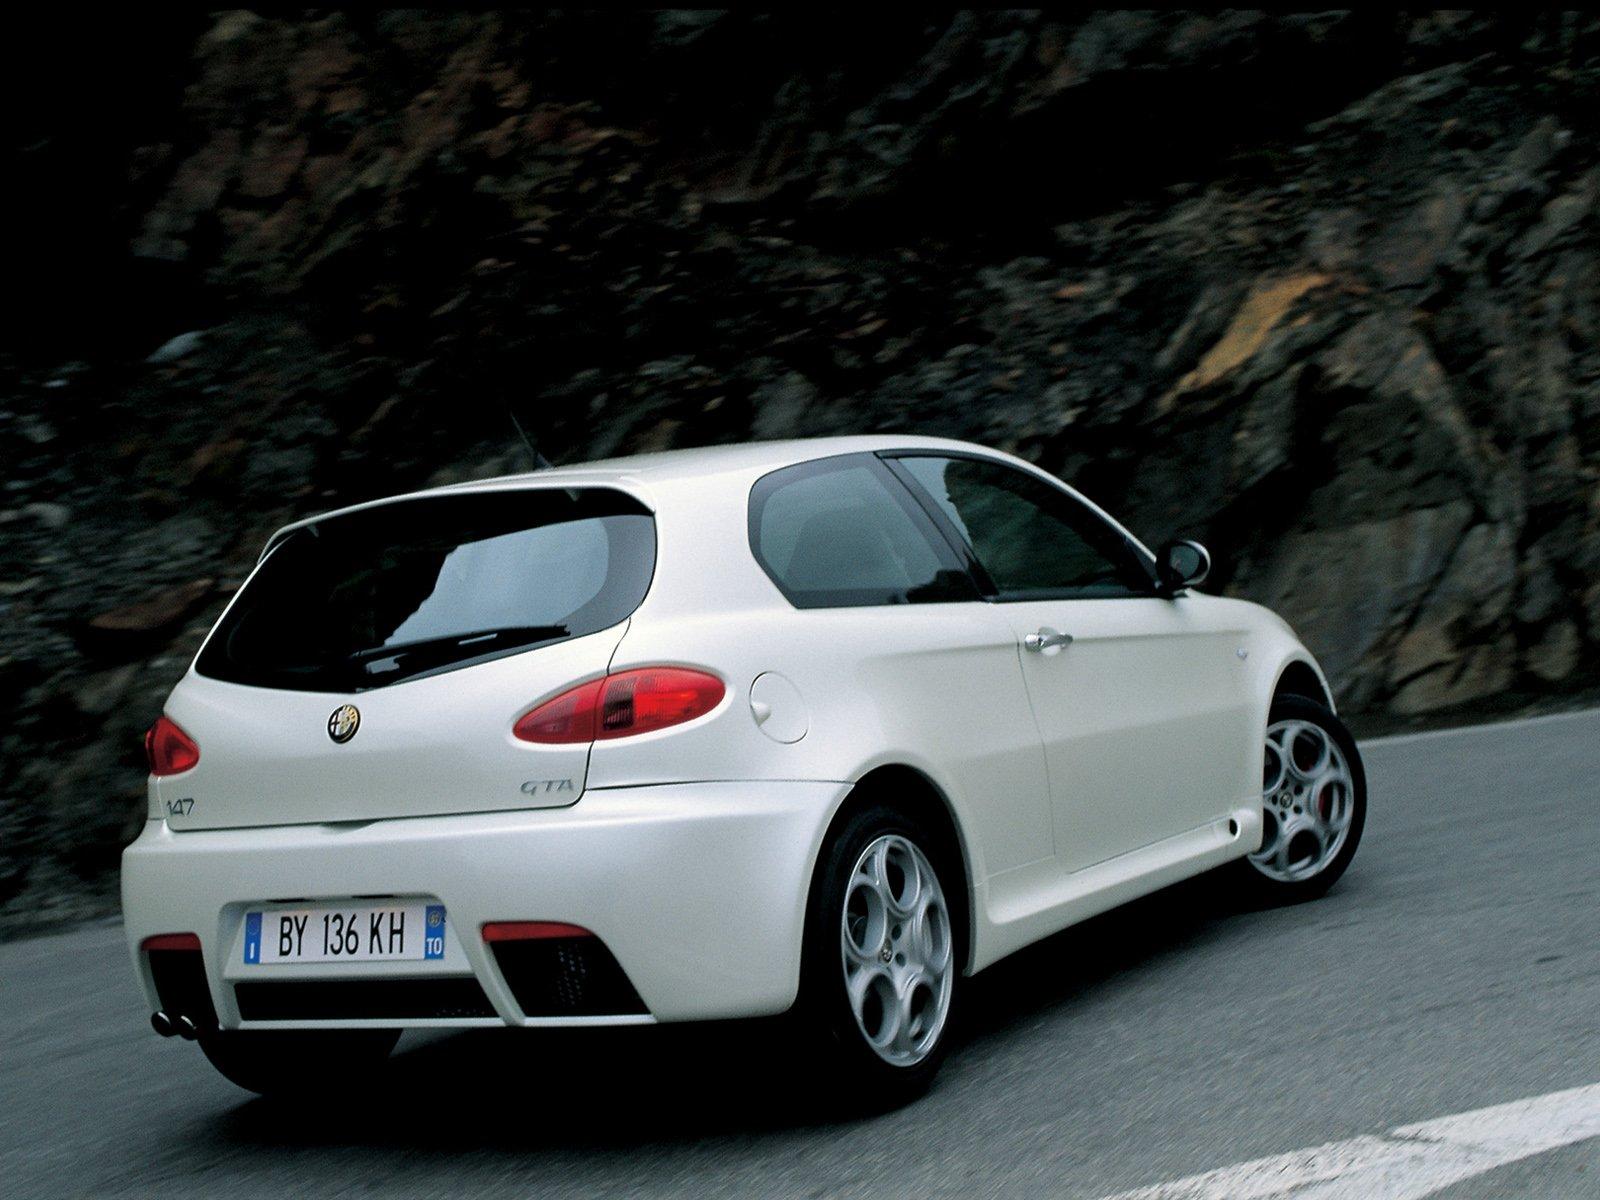 ALFA ROMEO 147 GTA specs - 2003, 2004, 2005 - autoevolution